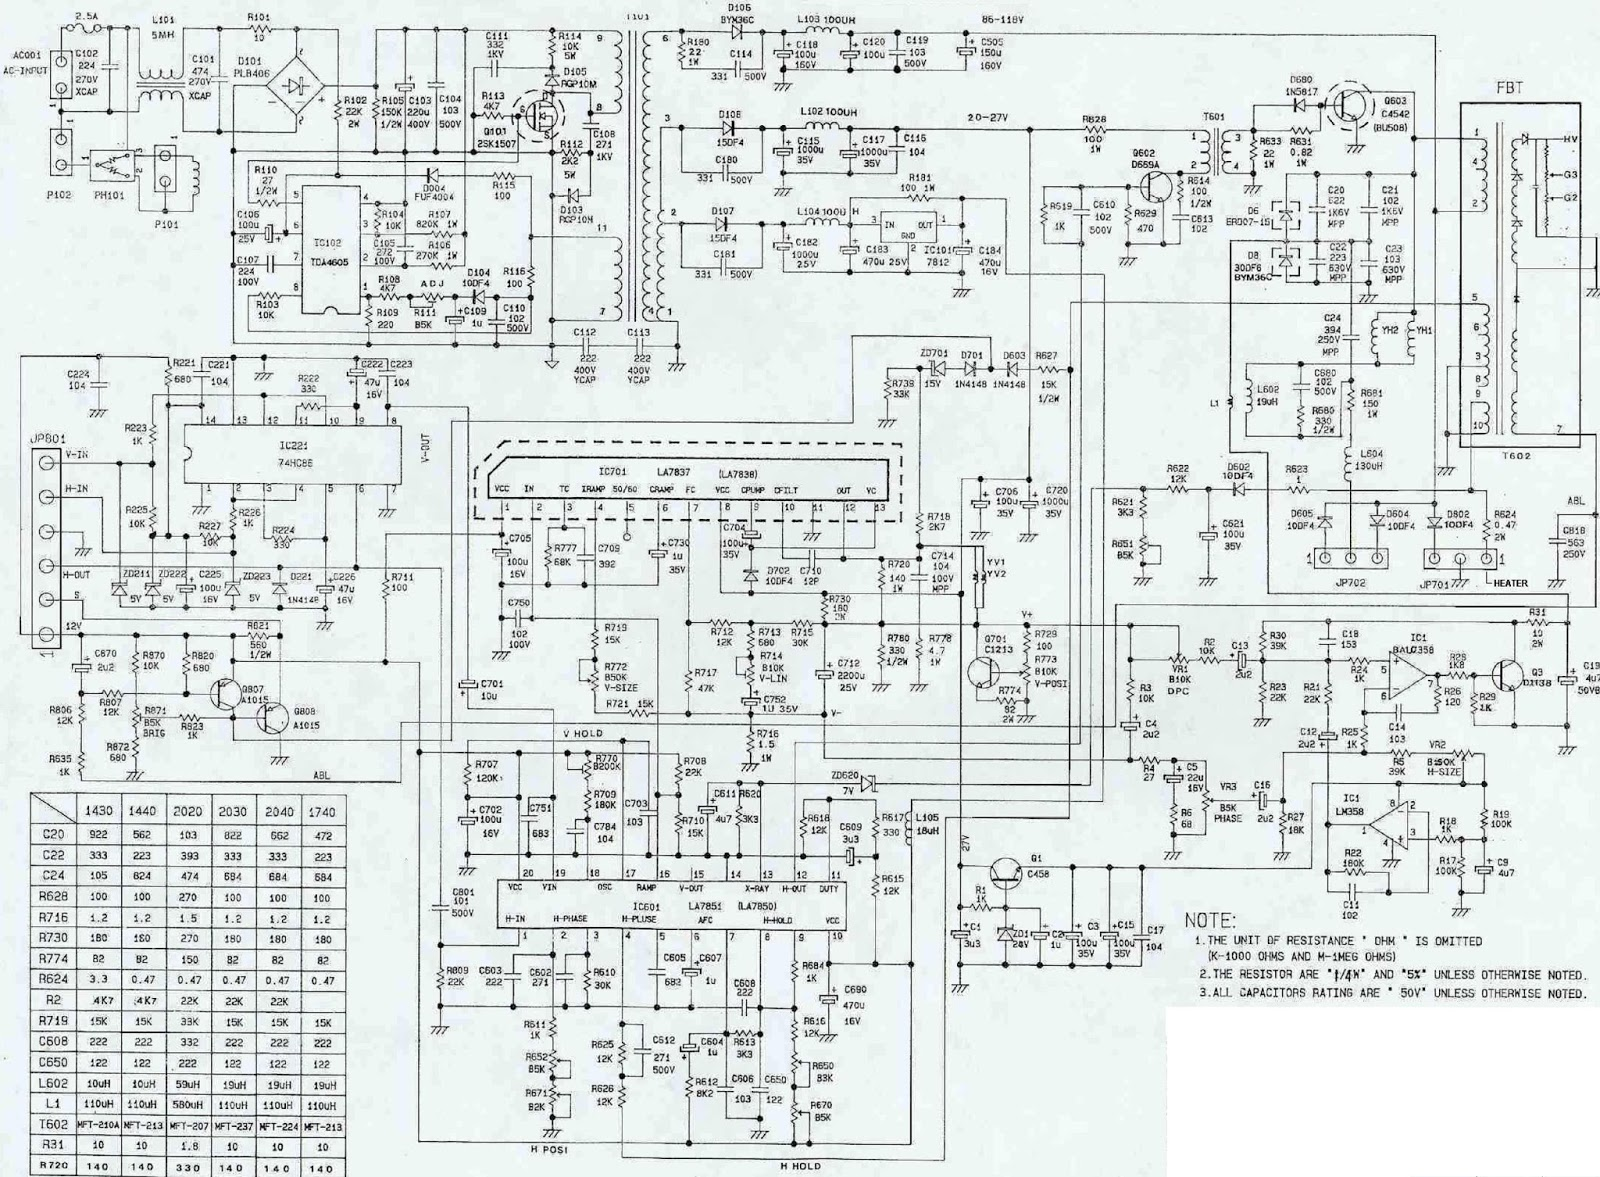 medium resolution of ps3 wiring diagram 14 7 fearless wonder de u2022